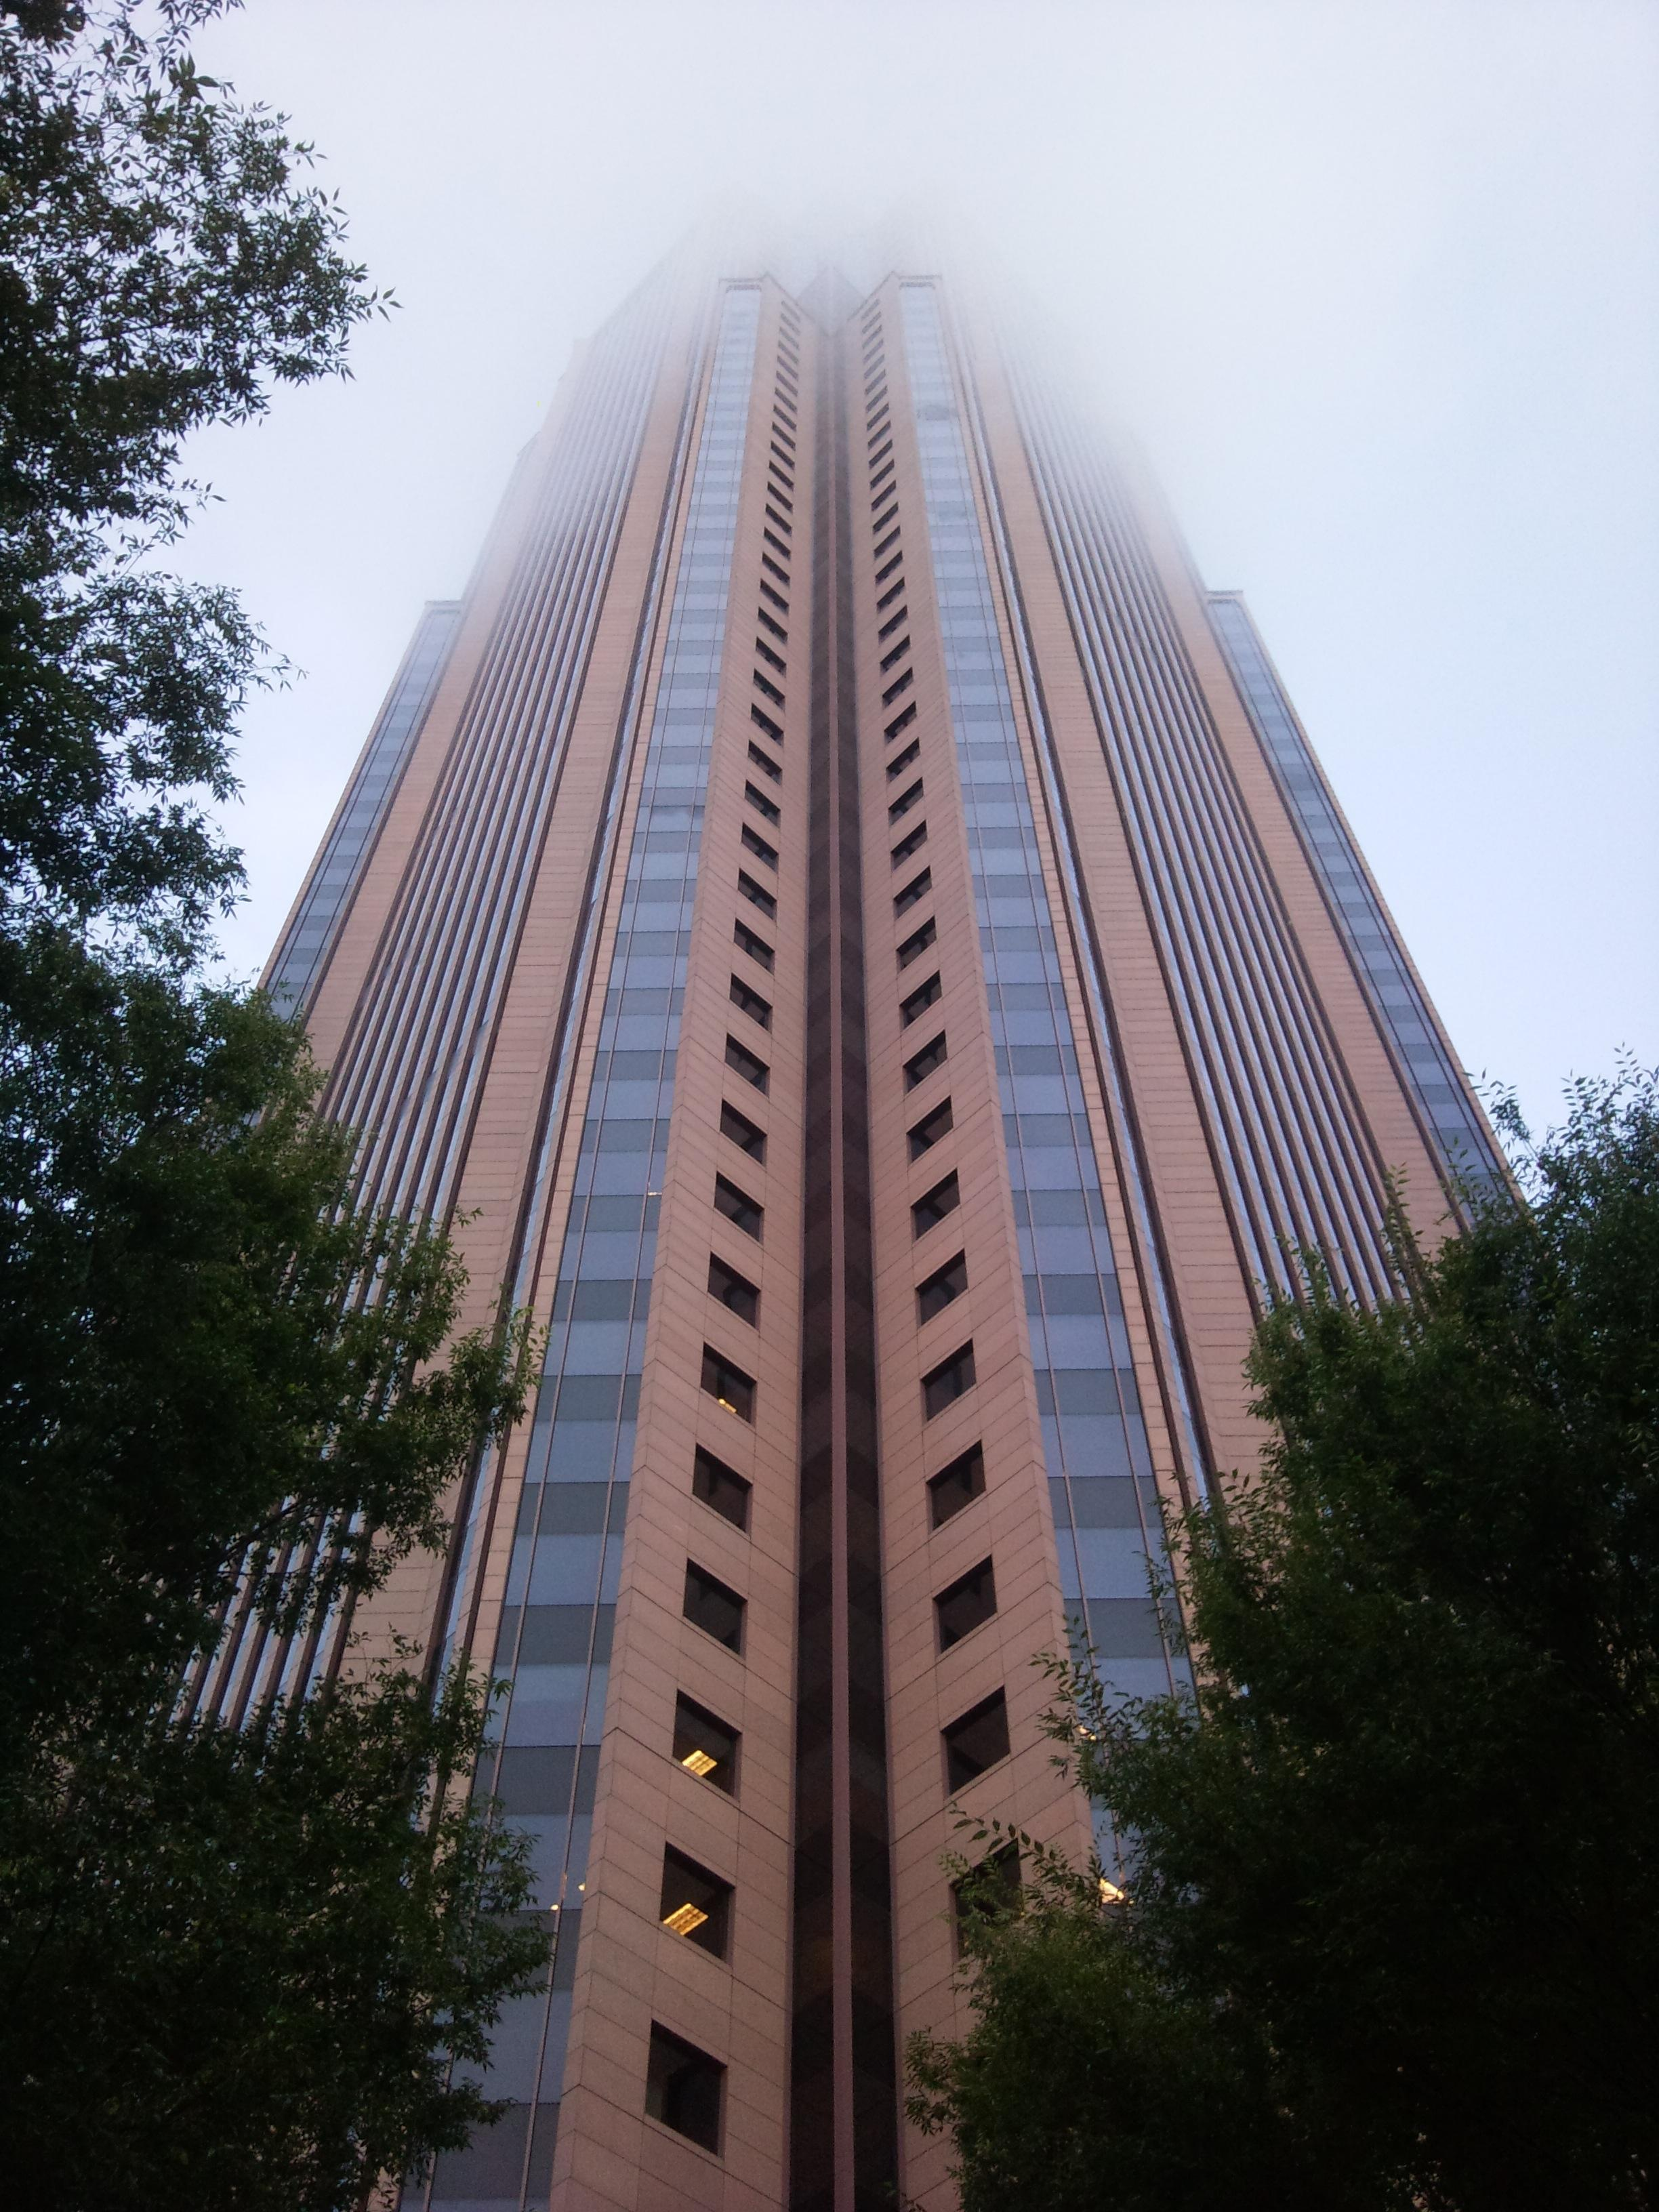 bank of america plaza atlanta usa fog skyscraper